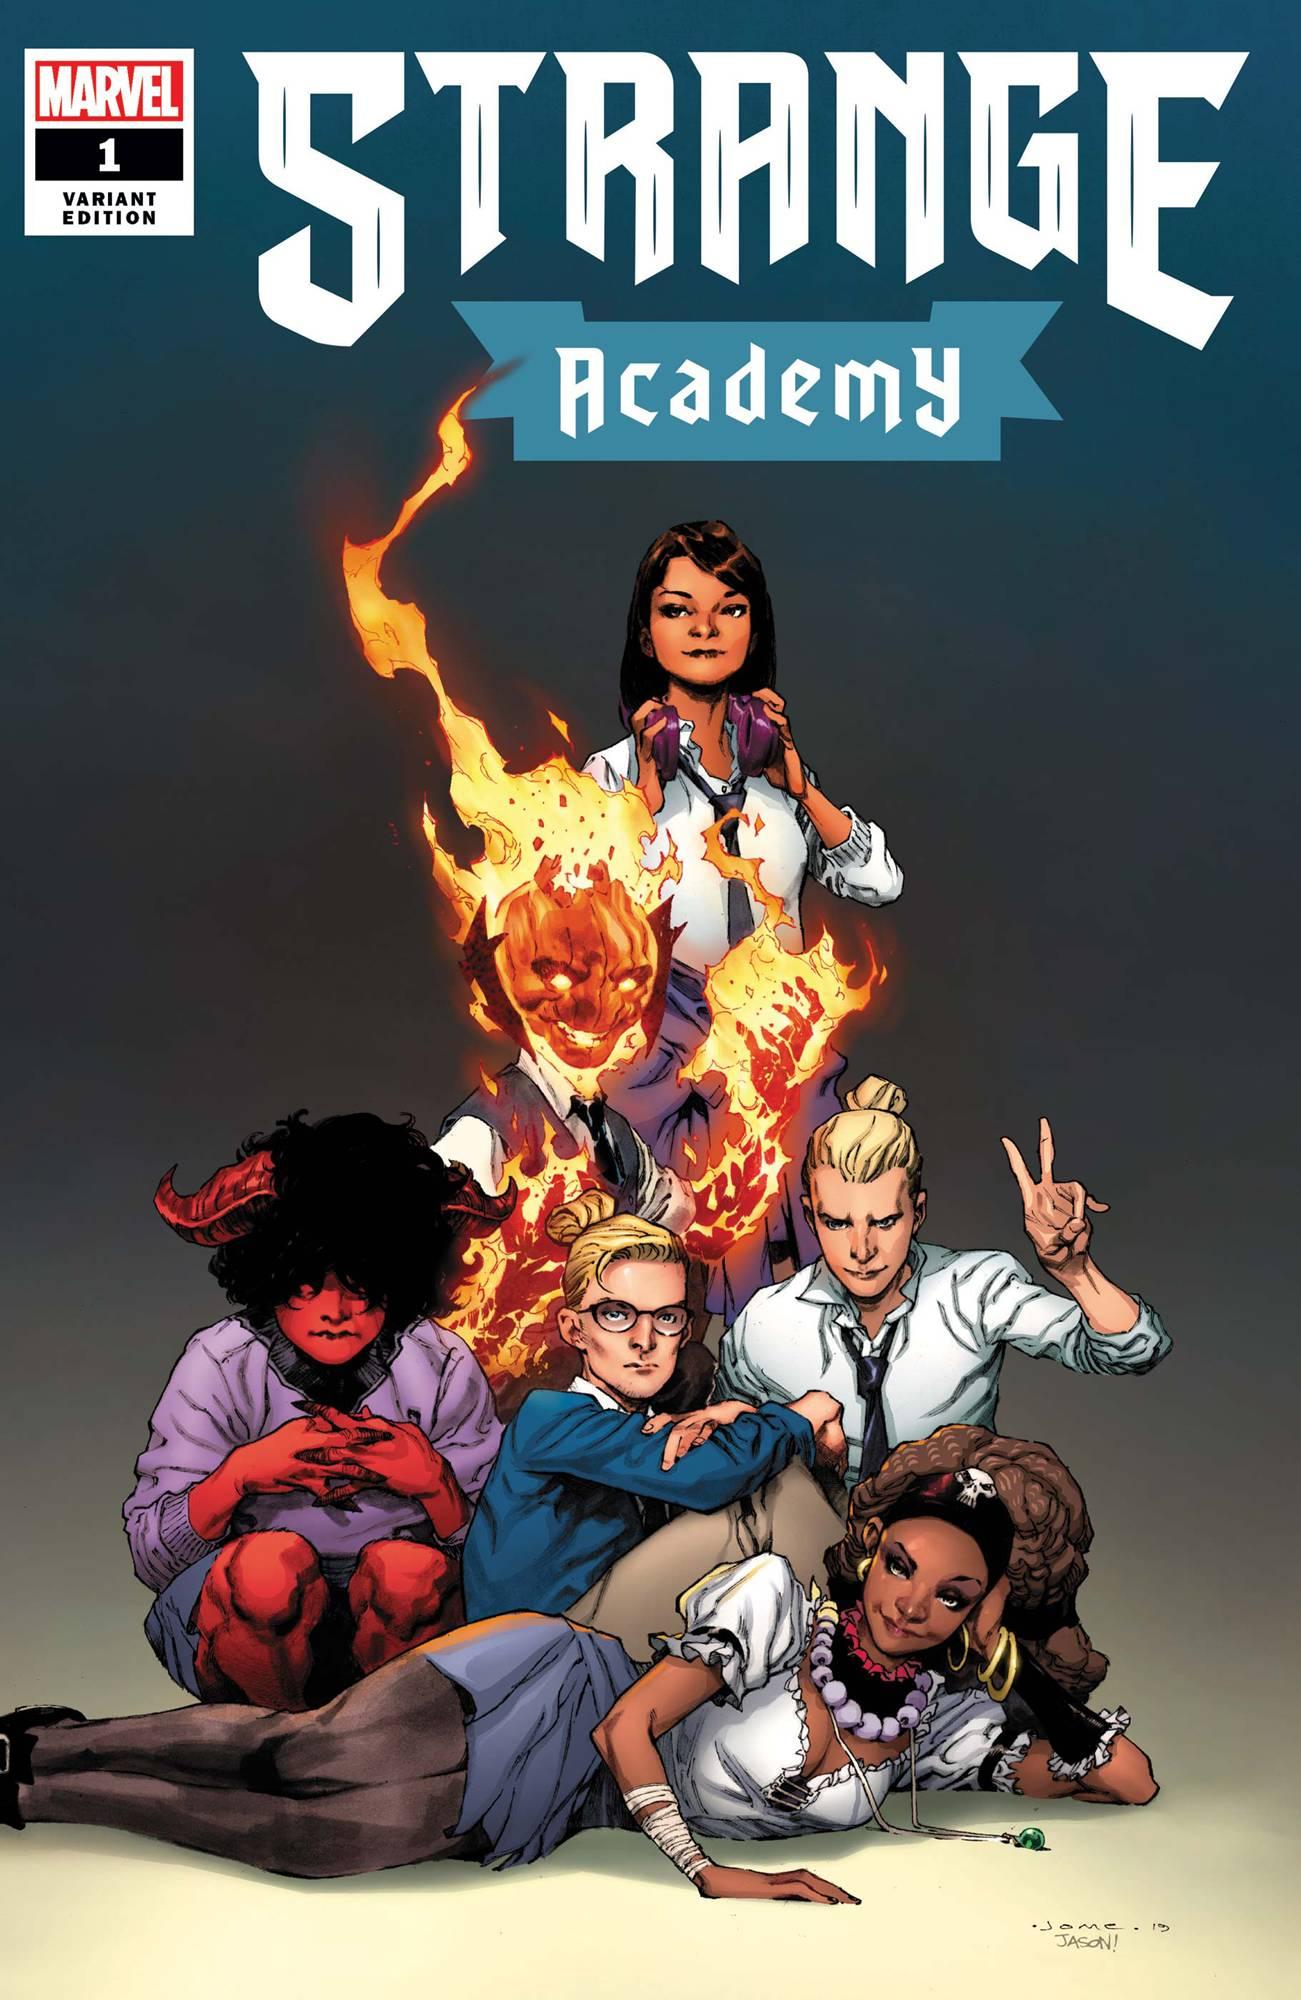 Strange Academy #1 (2020)